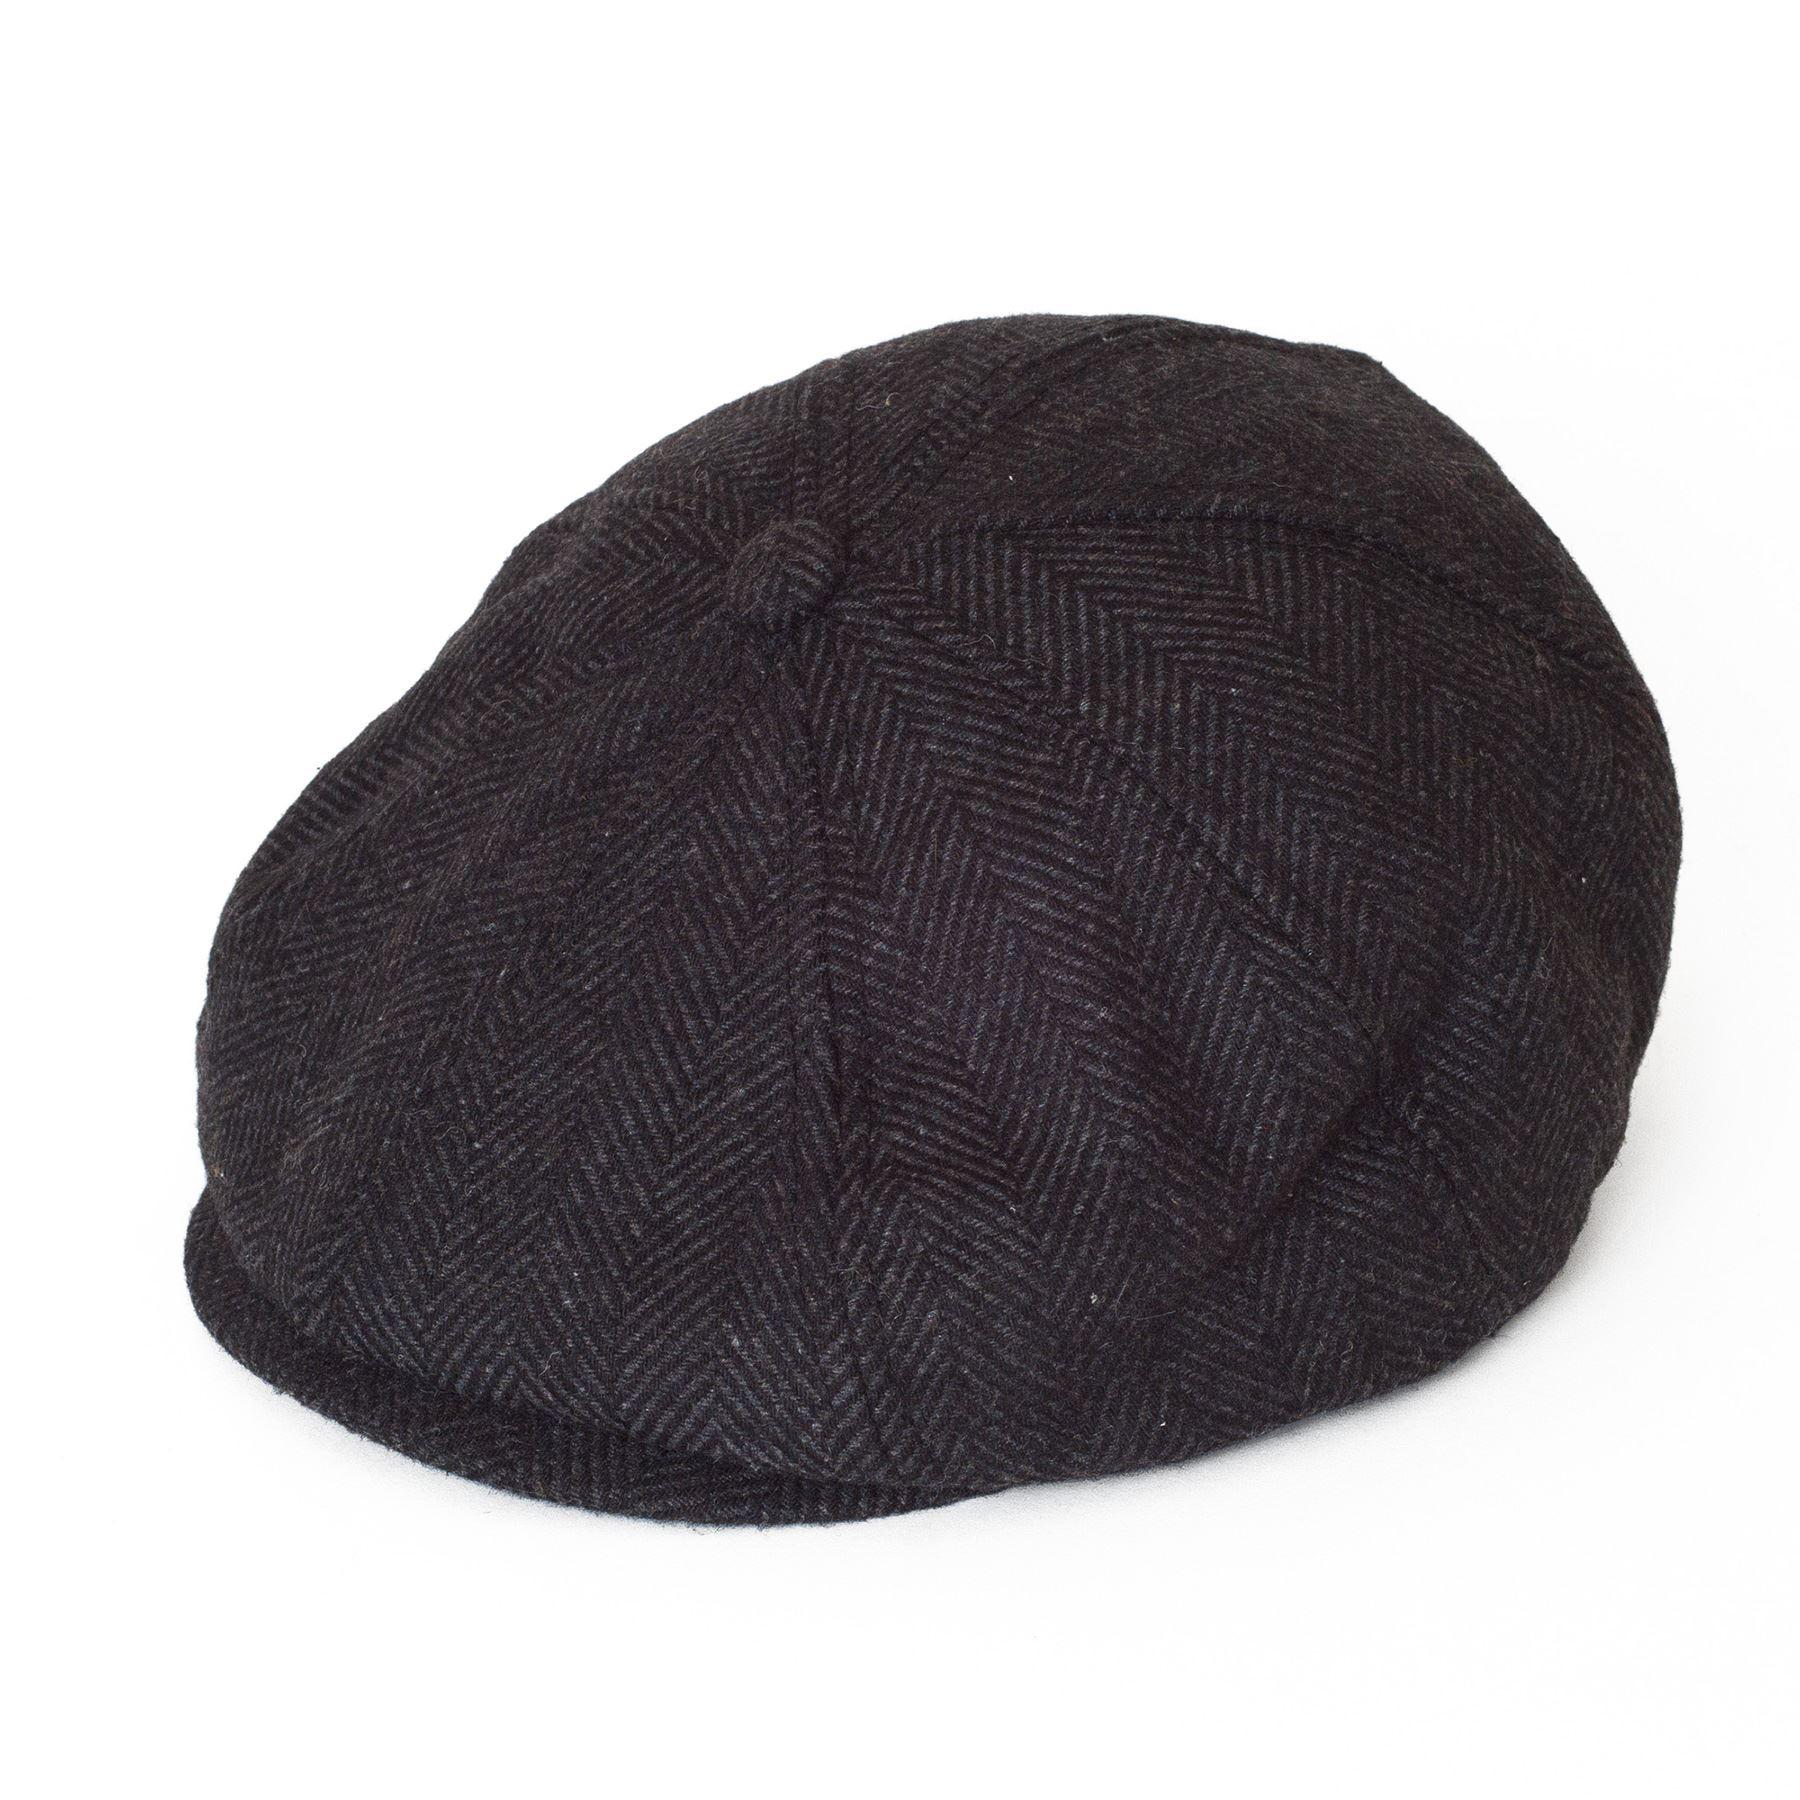 casquette de sport plate gavroche gatsby laine m lang avec motif chevrons ebay. Black Bedroom Furniture Sets. Home Design Ideas